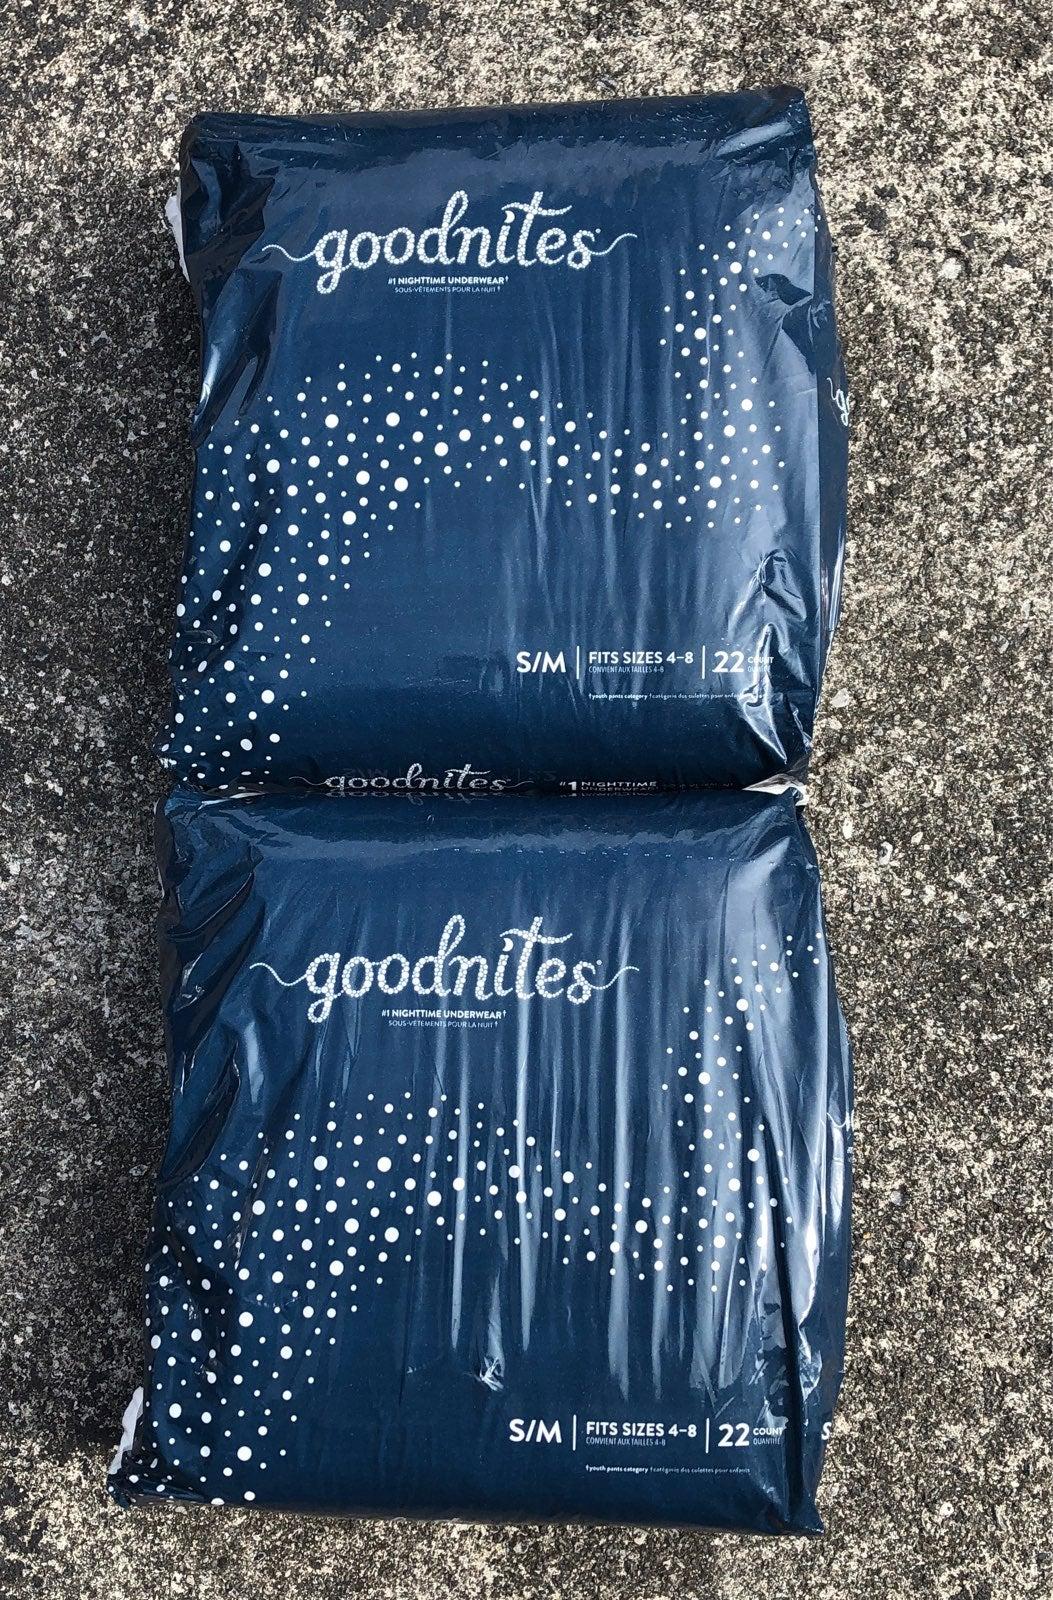 Goodnites Size S/M